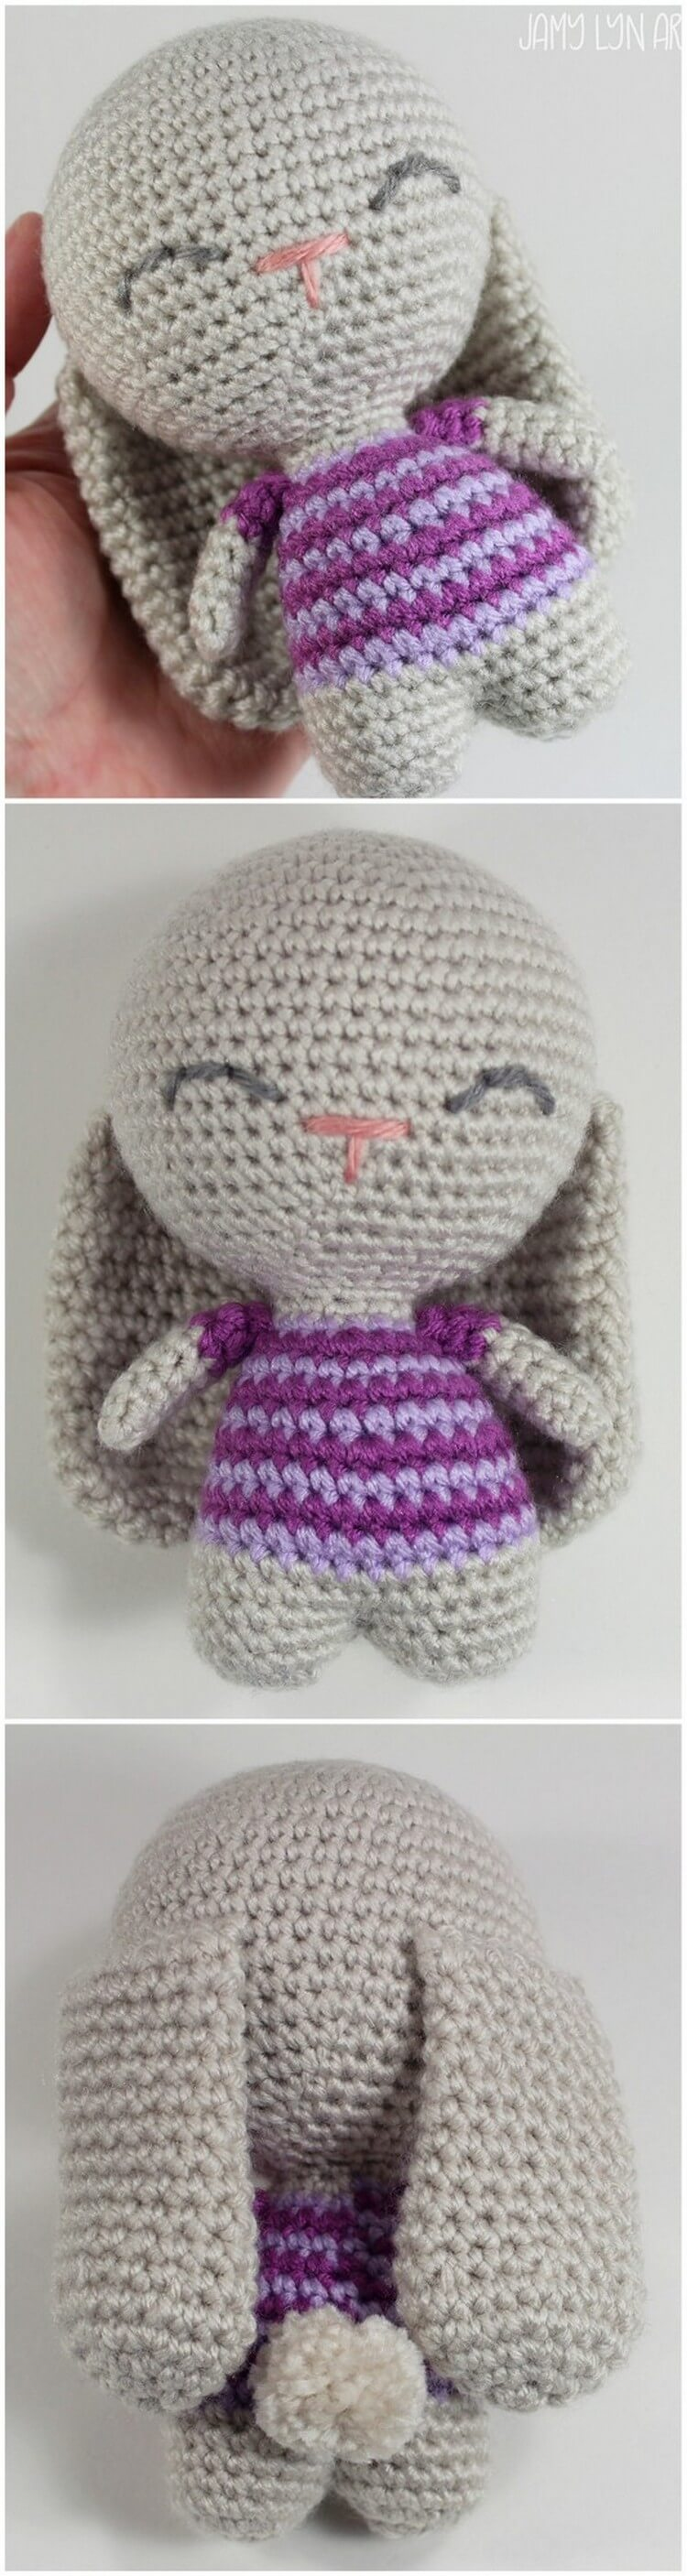 Crochet Amigurumi Pattern (14)